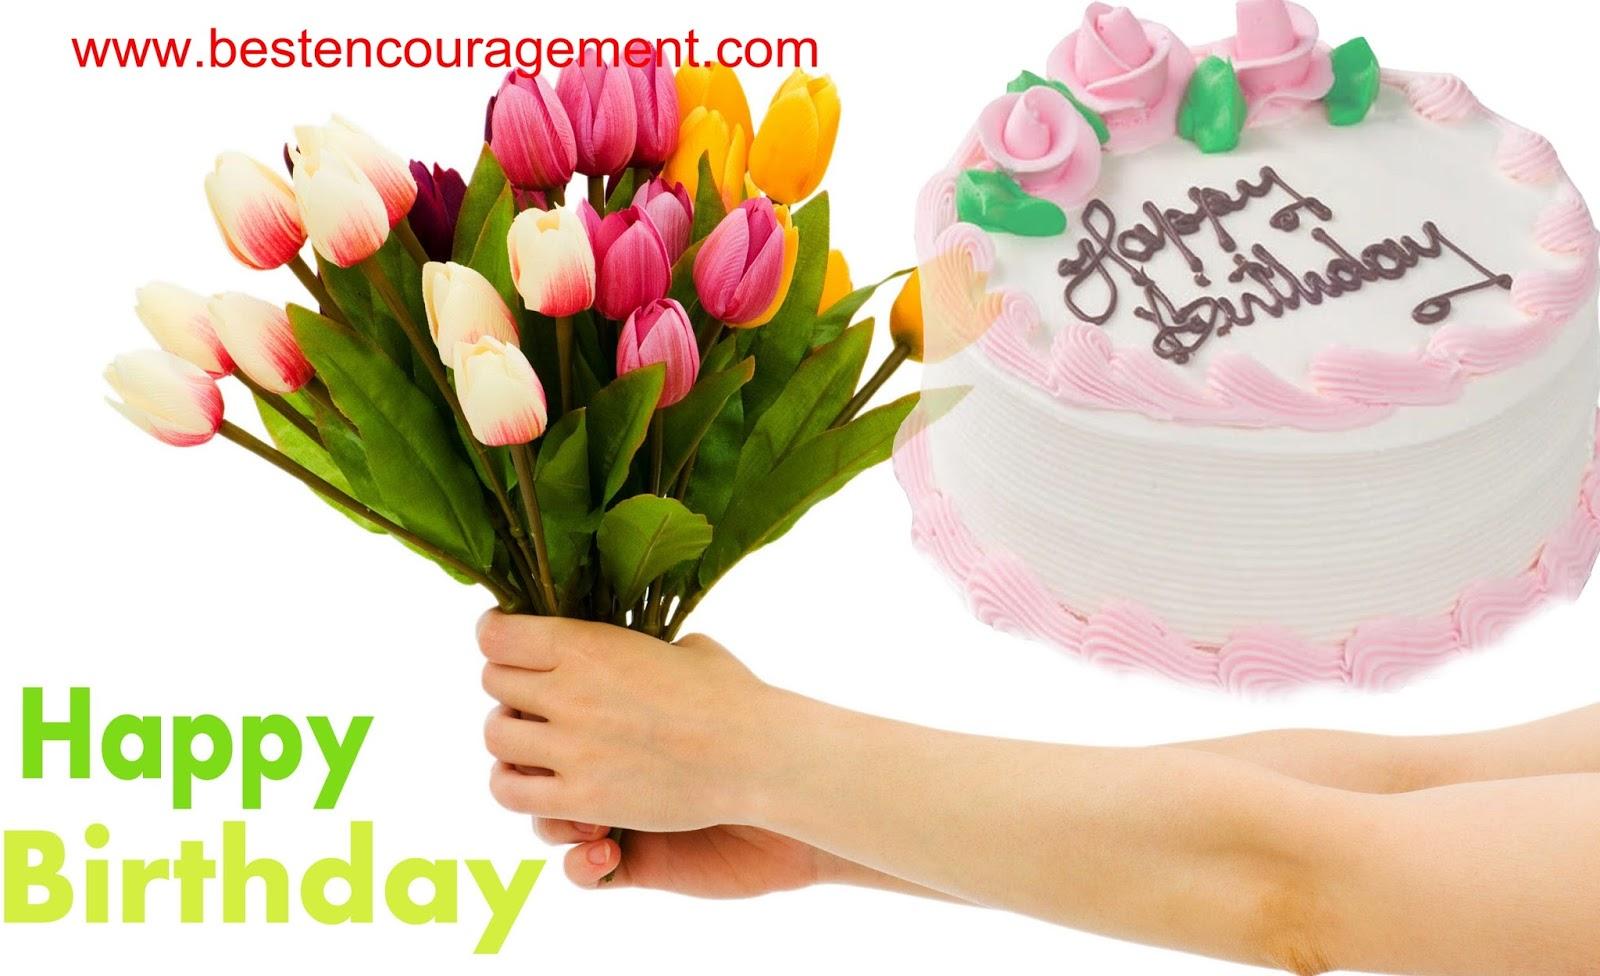 Happy birthday to ravi teja challa happy birthday to you telugu we will mention you your family members birthday wishes so send your birthday details izmirmasajfo